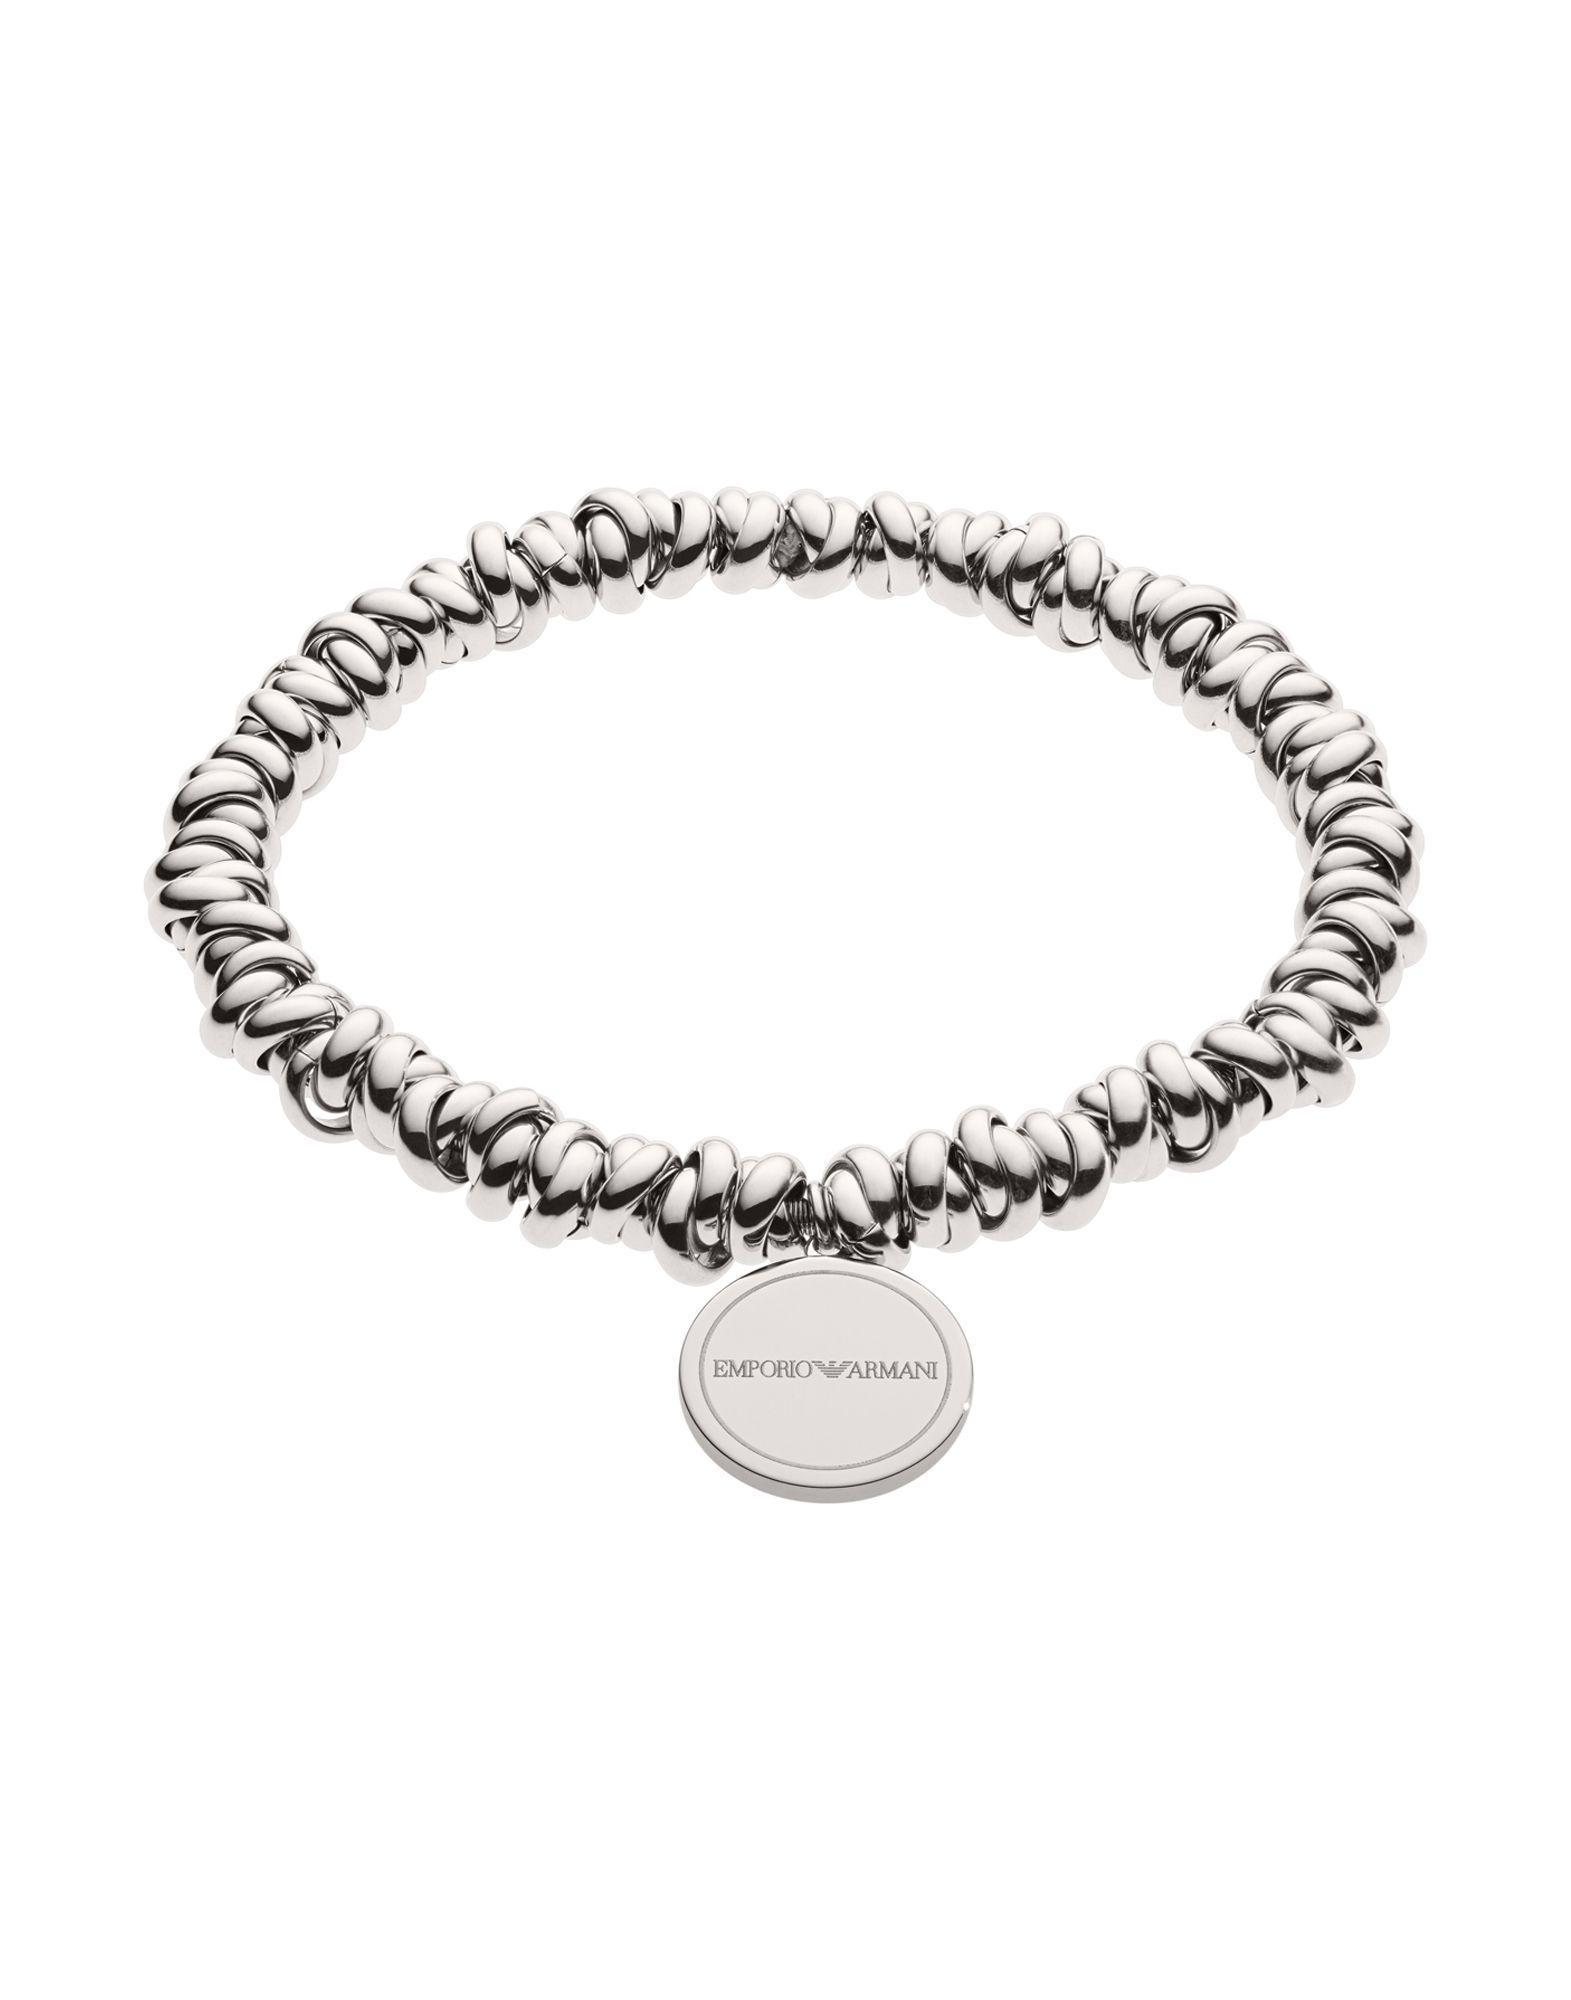 Emporio Armani Women's Bracelet EGS2348710 heOUk0m